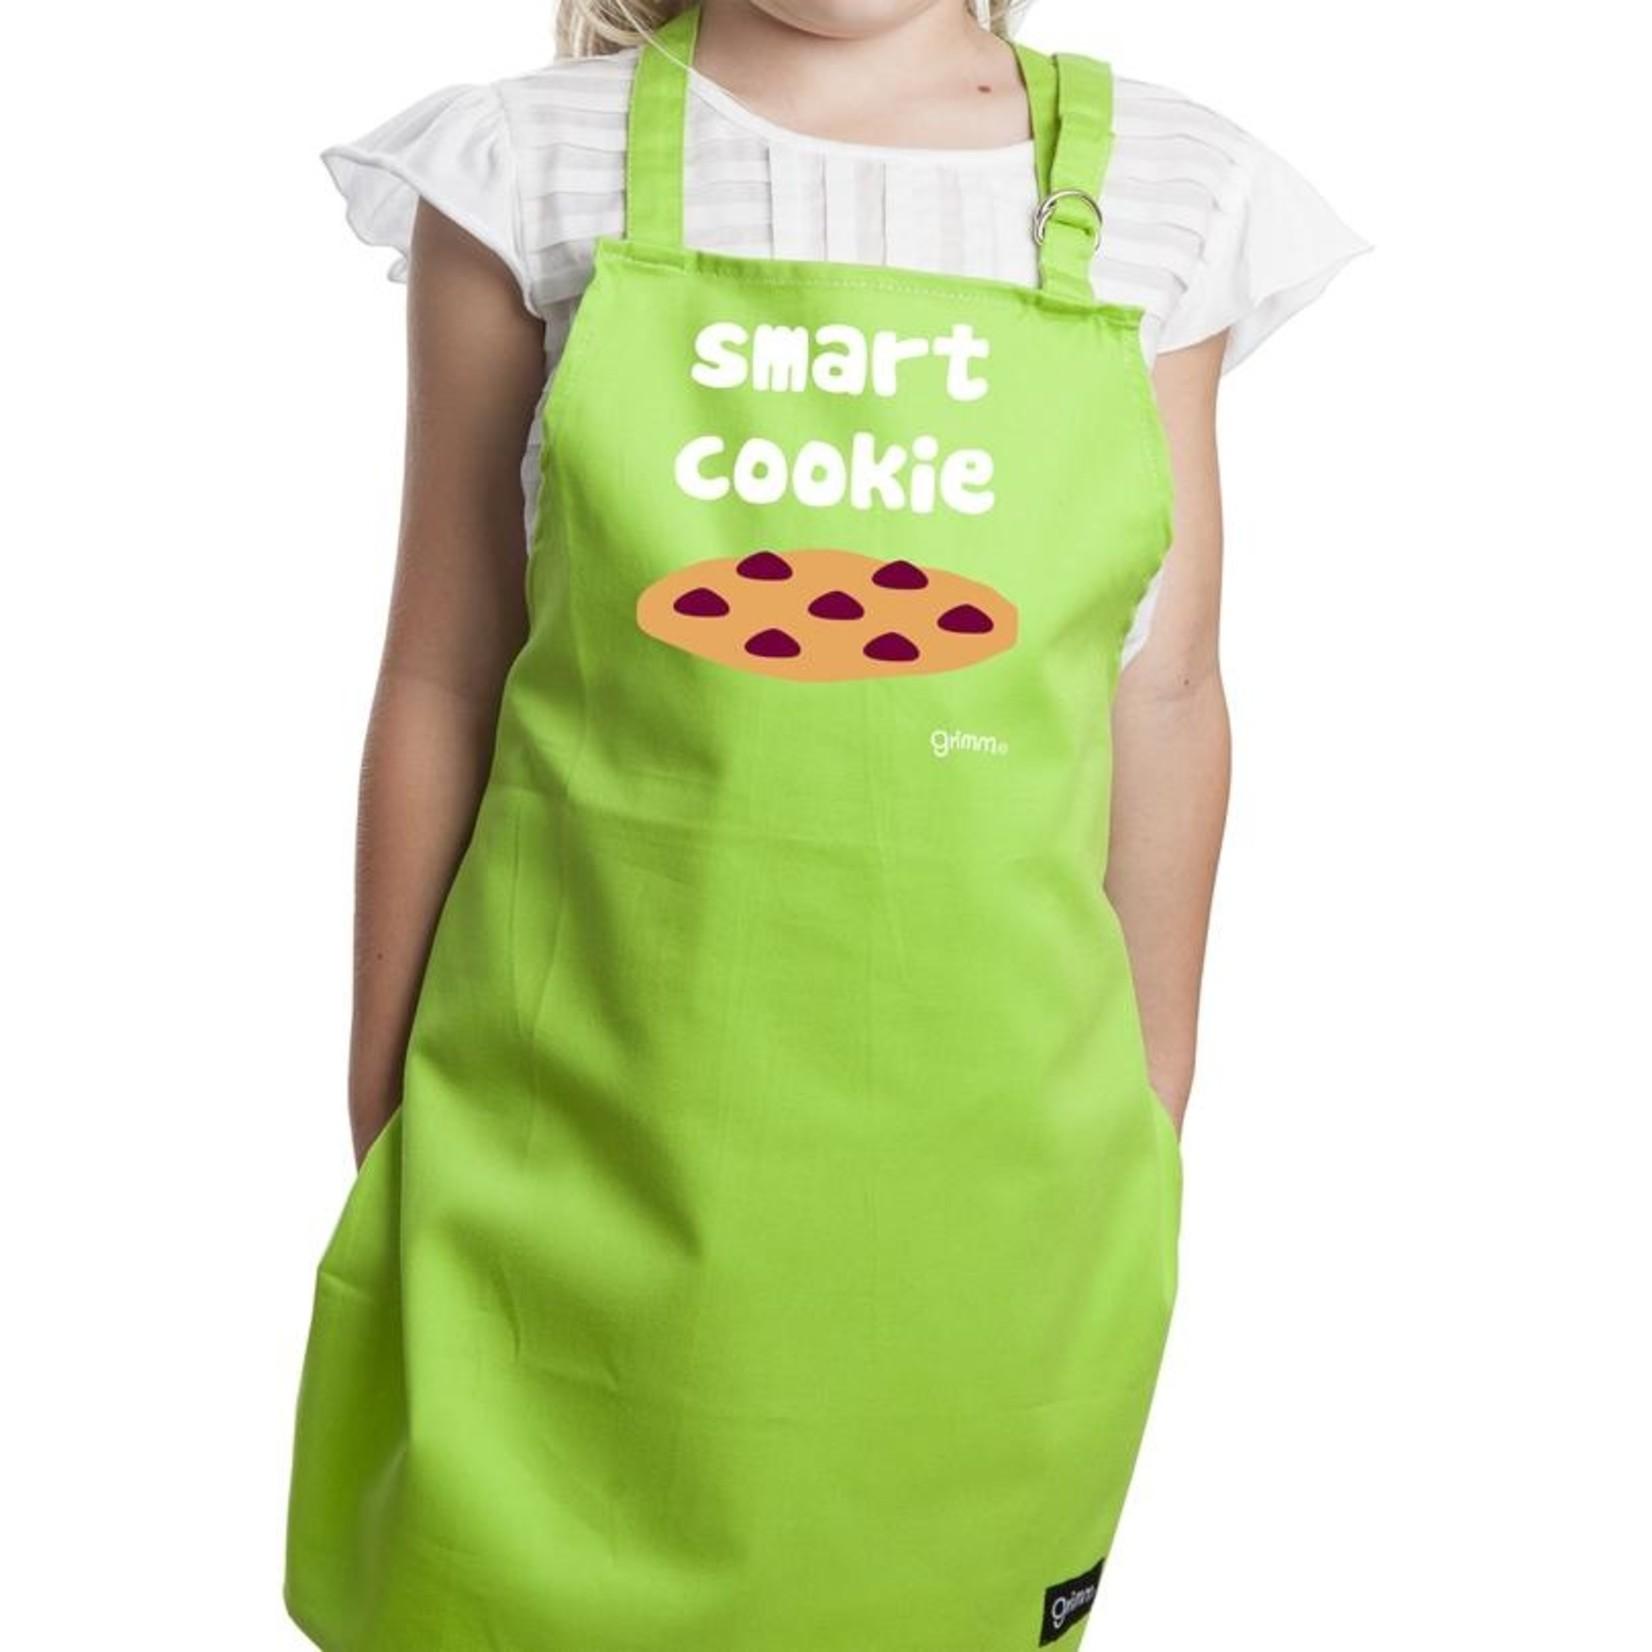 Children's Apron - Smart Cookie